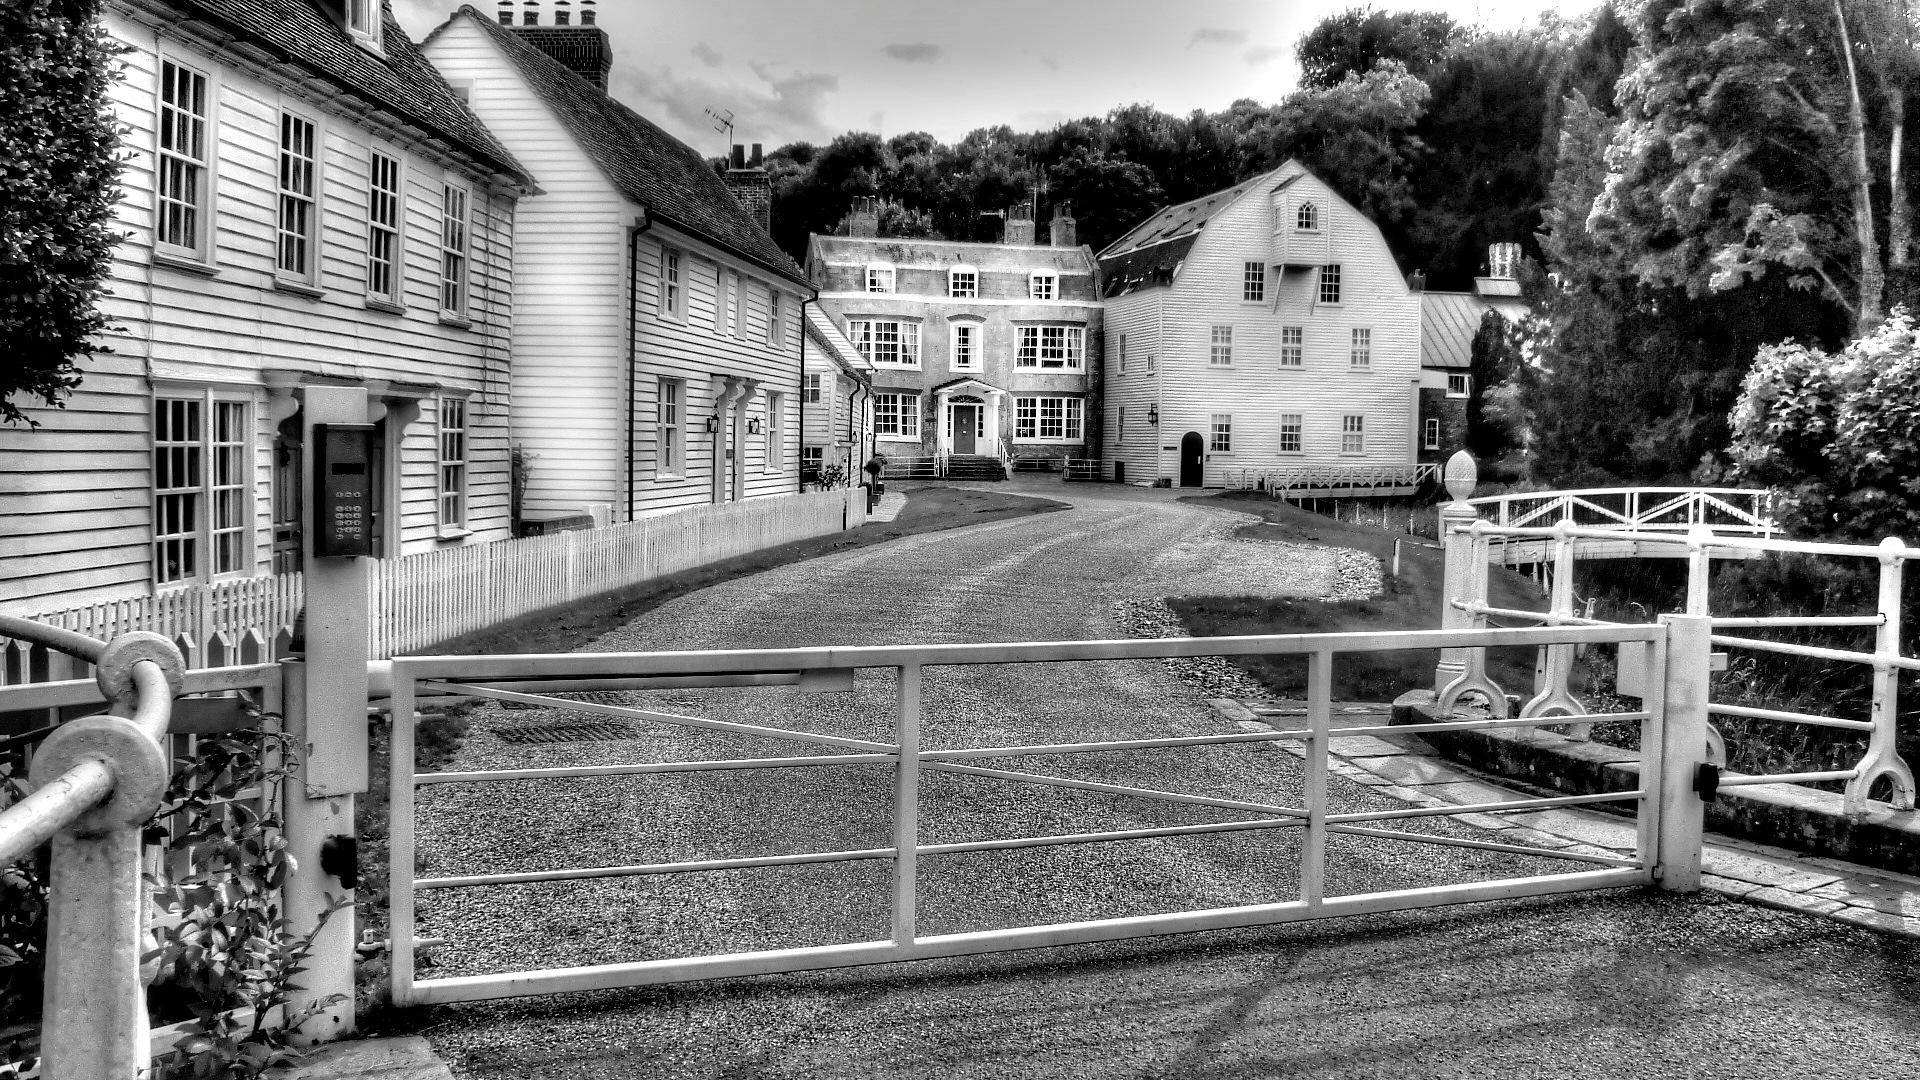 The Mill House - Farningham. Kent by stephen.harding.735